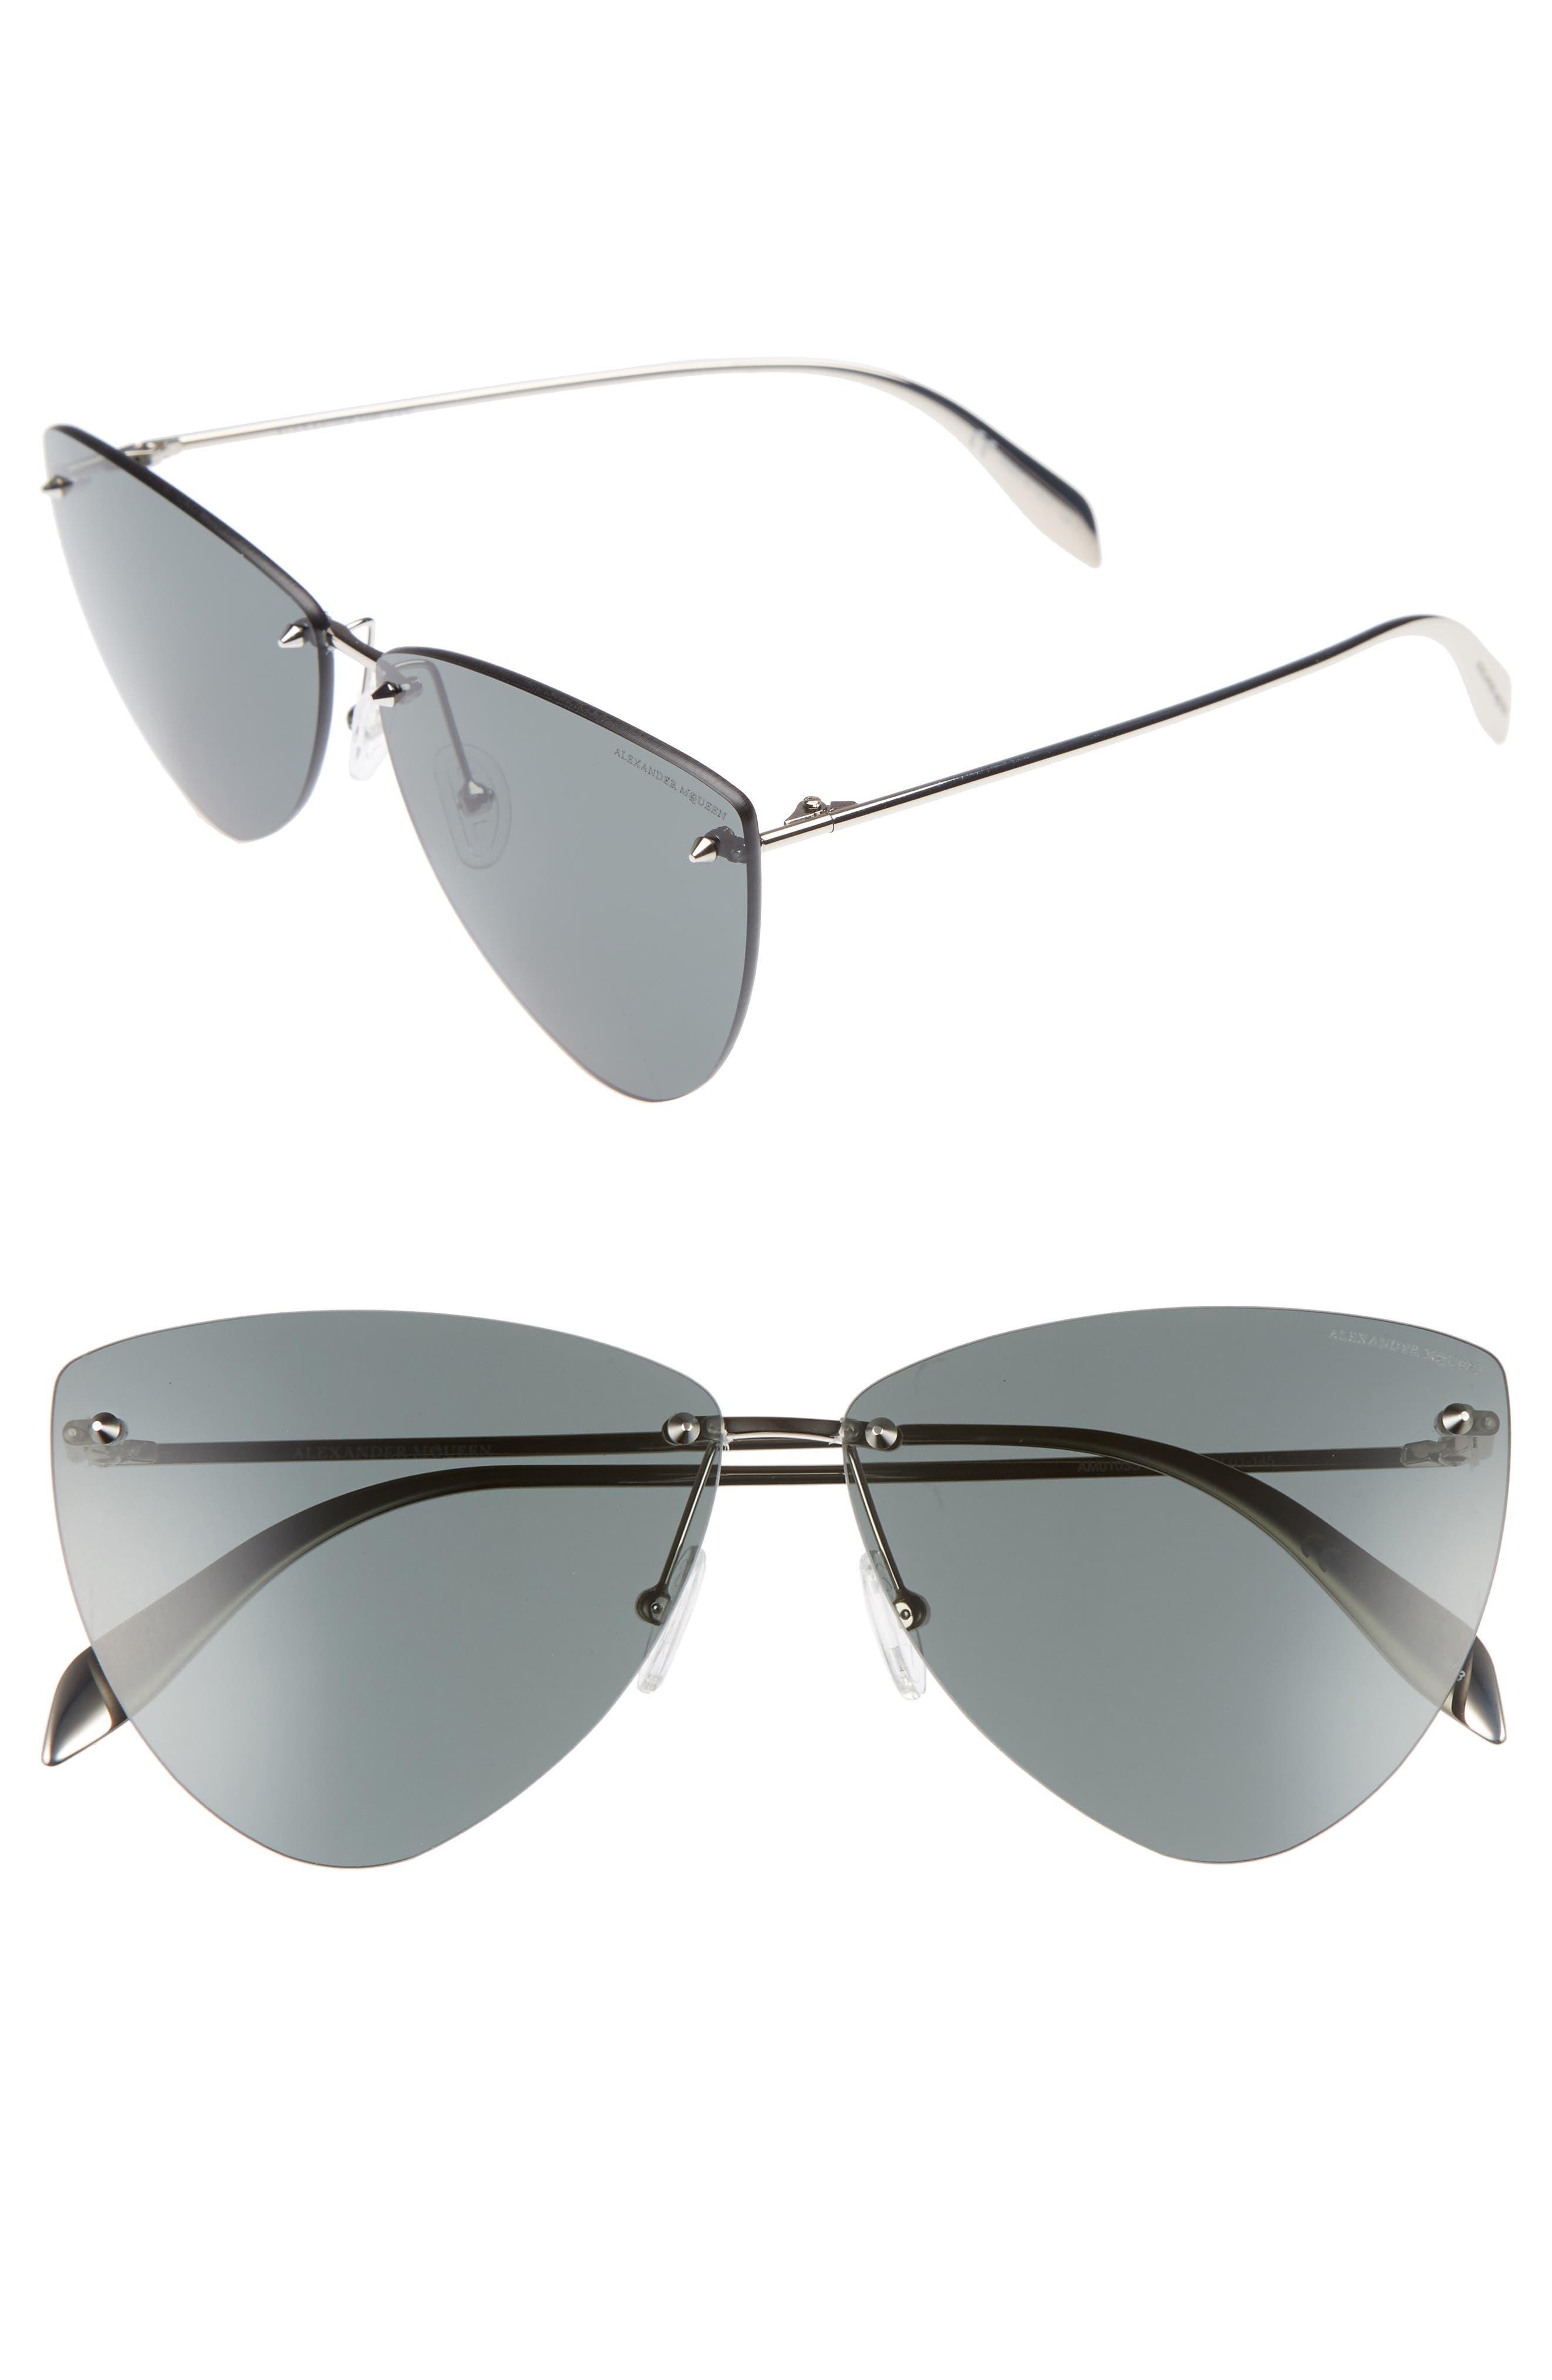 63mm Oversize Rimless Sunglasses,                             Main thumbnail 1, color,                             Silver